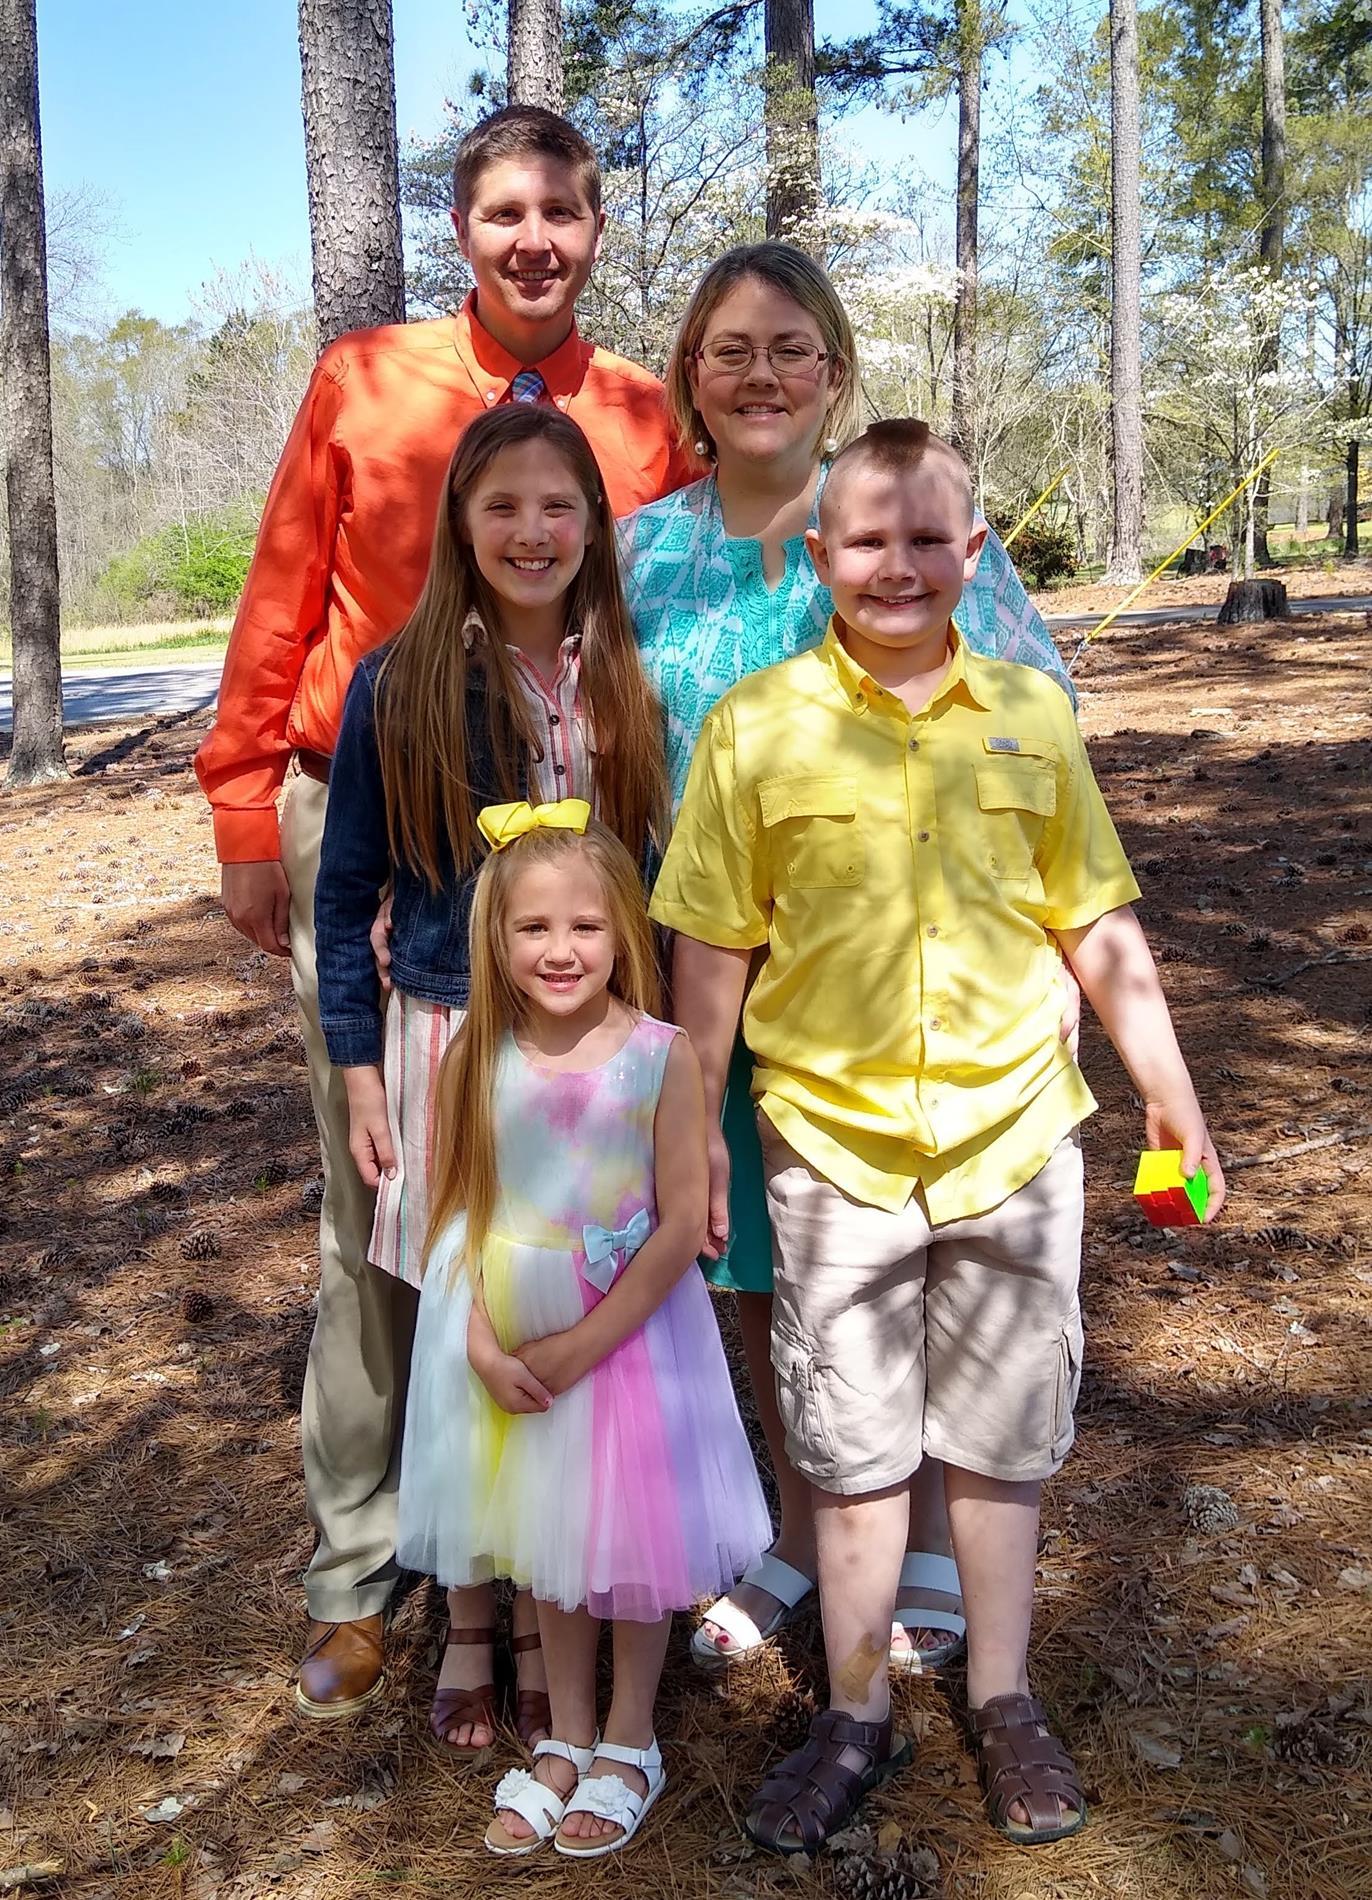 Coach Bramble's Family